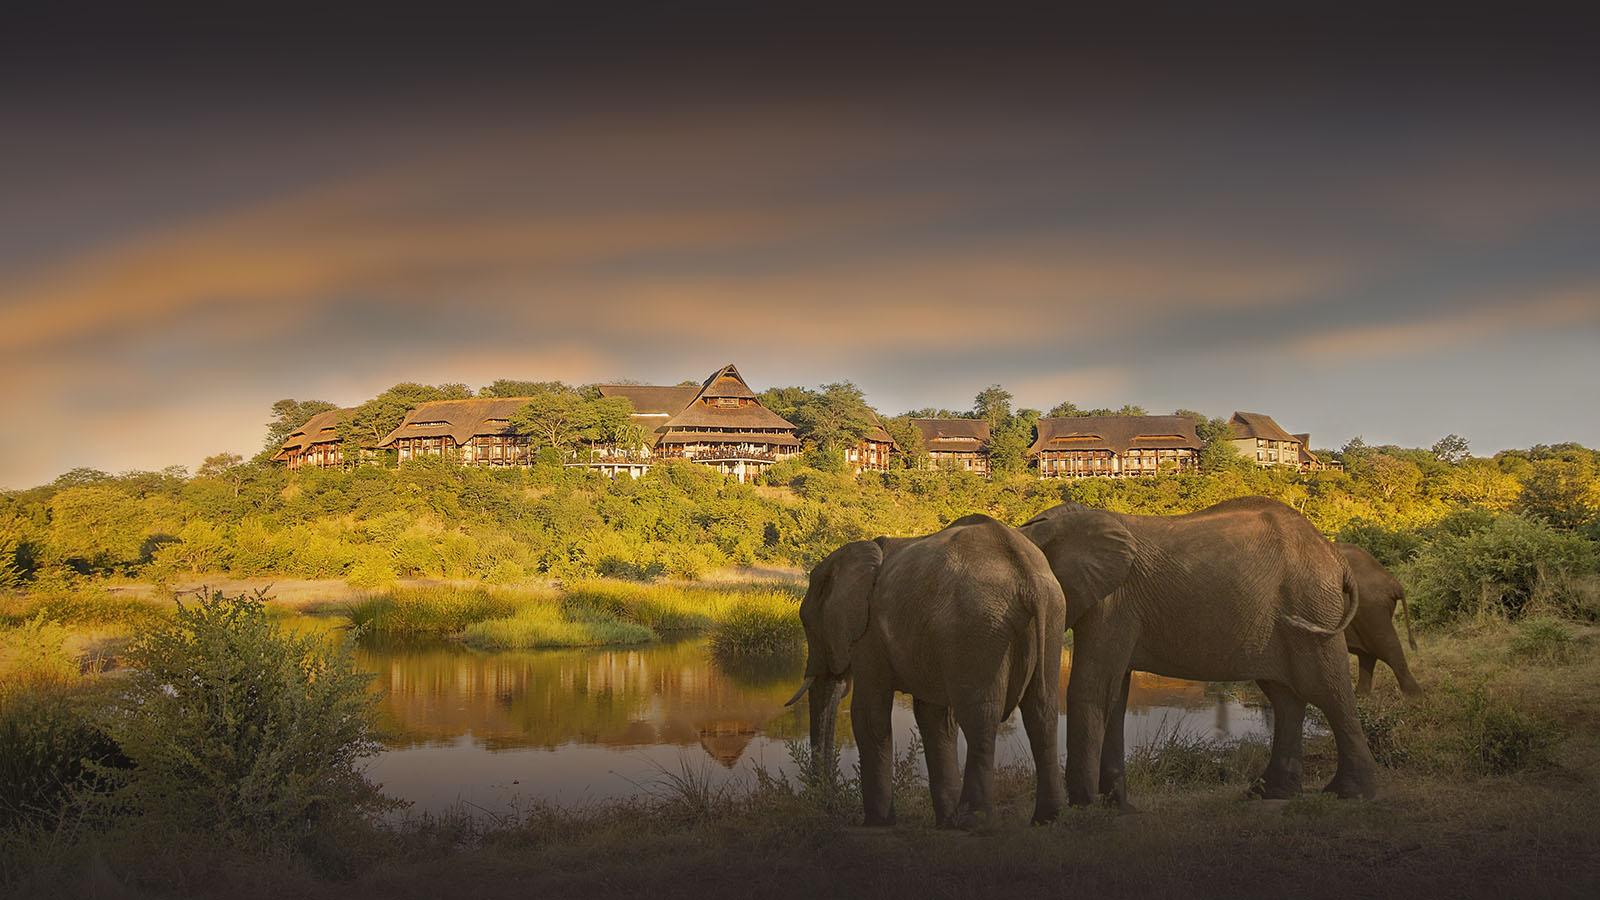 victoria falls safari lodge zimbabwe-lodges-accommodation-vic-falls-elephants